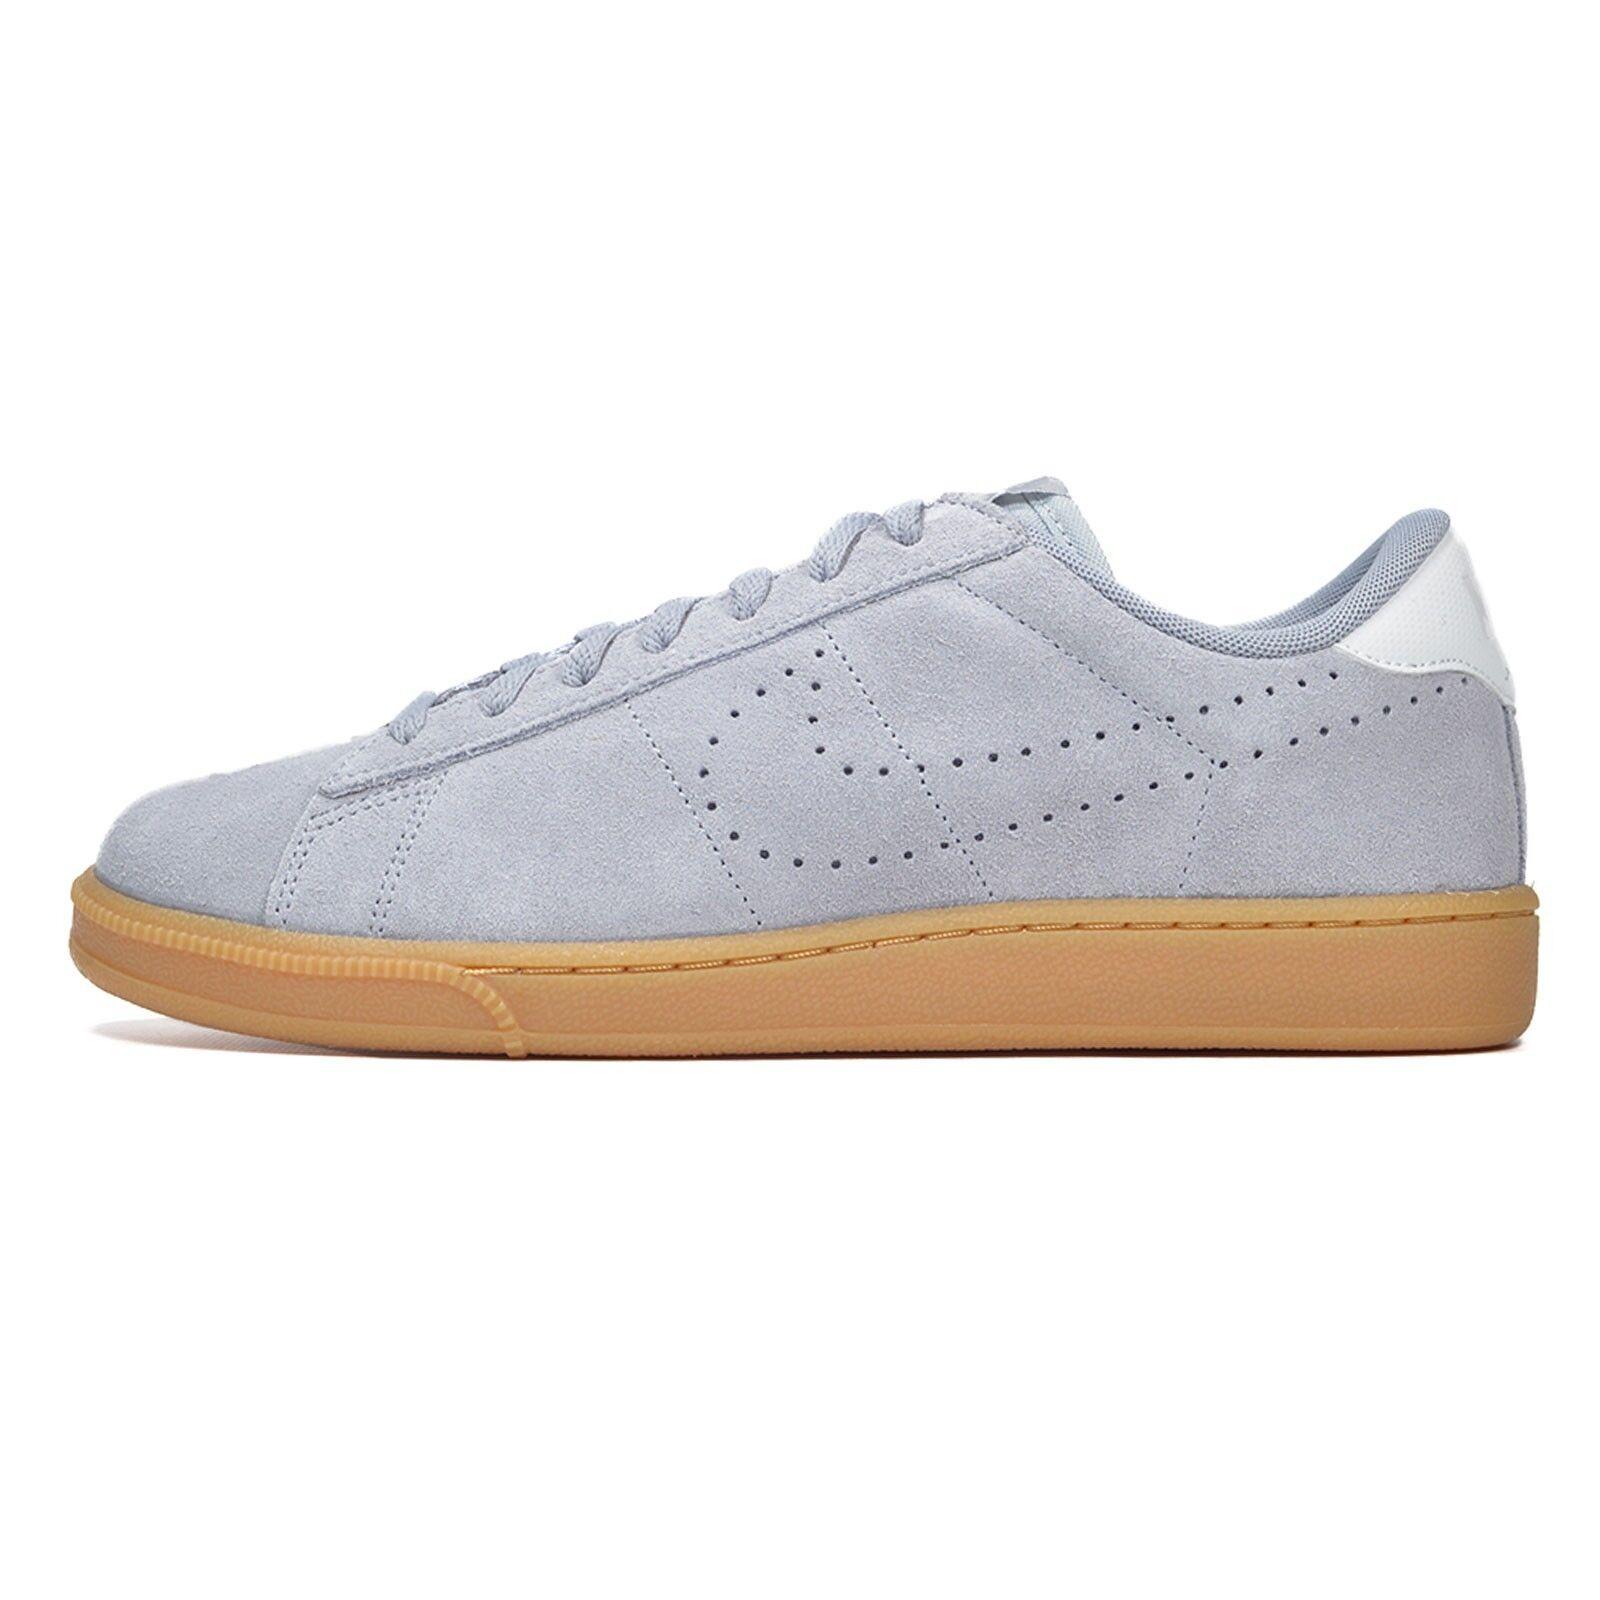 Nike Tennis Classic CS Suede Men's Athletic Sneakers 829351